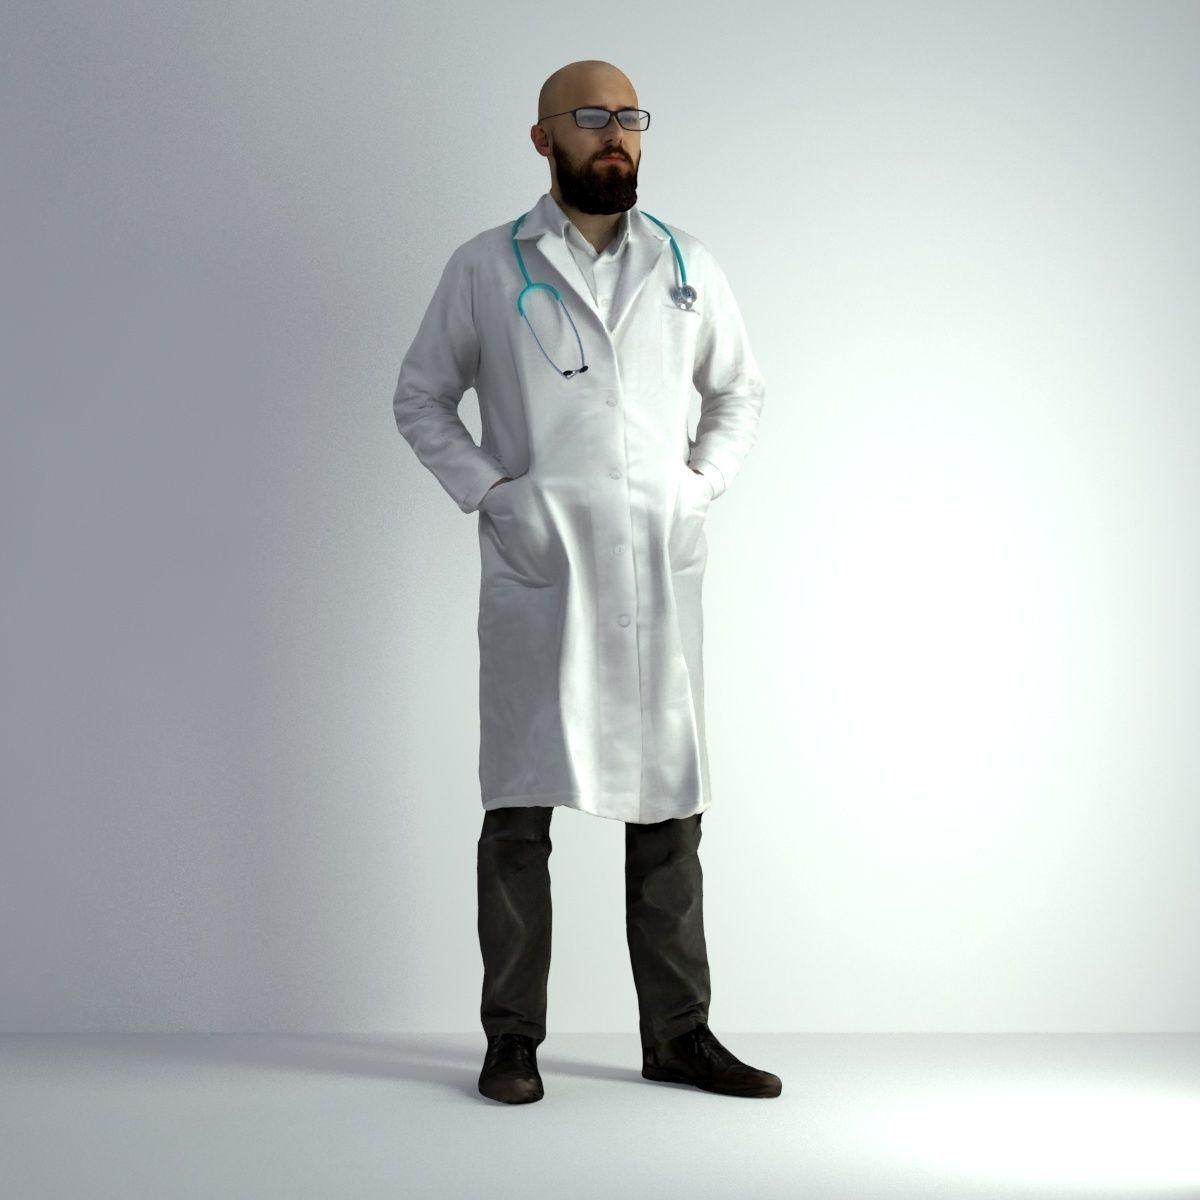 3D Scan Man Doctor 020